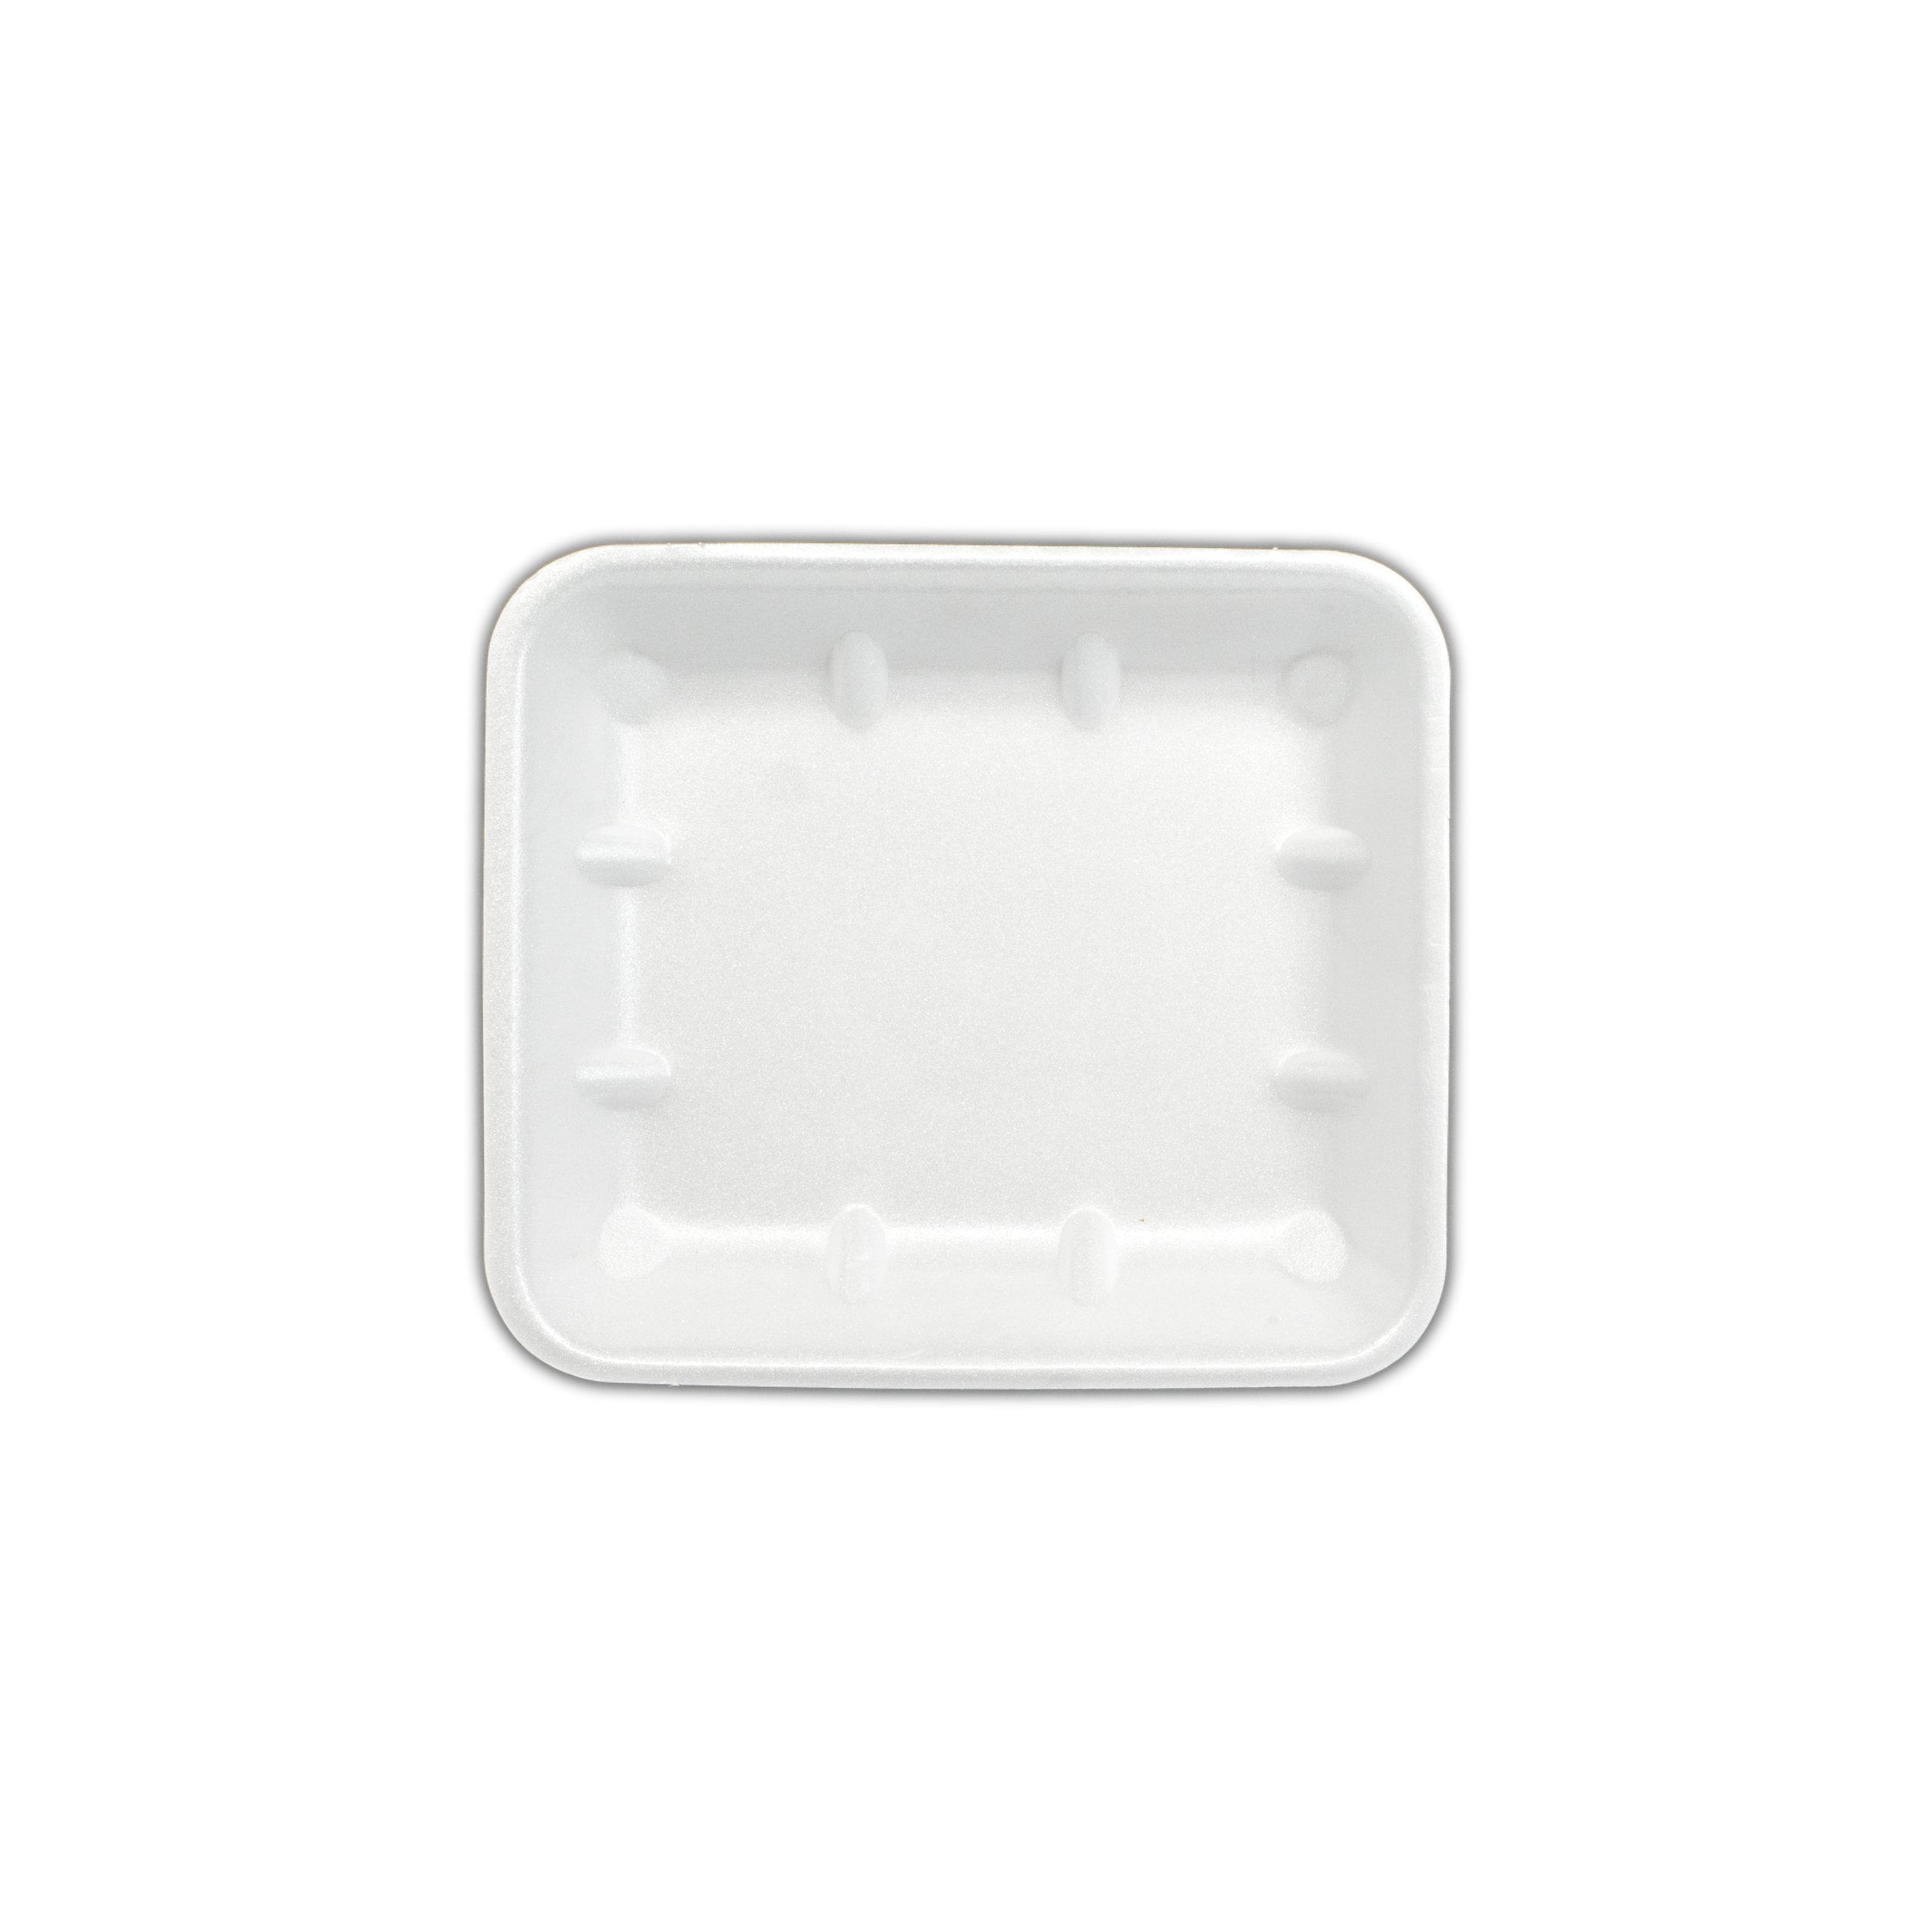 iK0205 CLOSED CELL D  EEP 8x7 WHITE   90 per sleeve 360 per carton